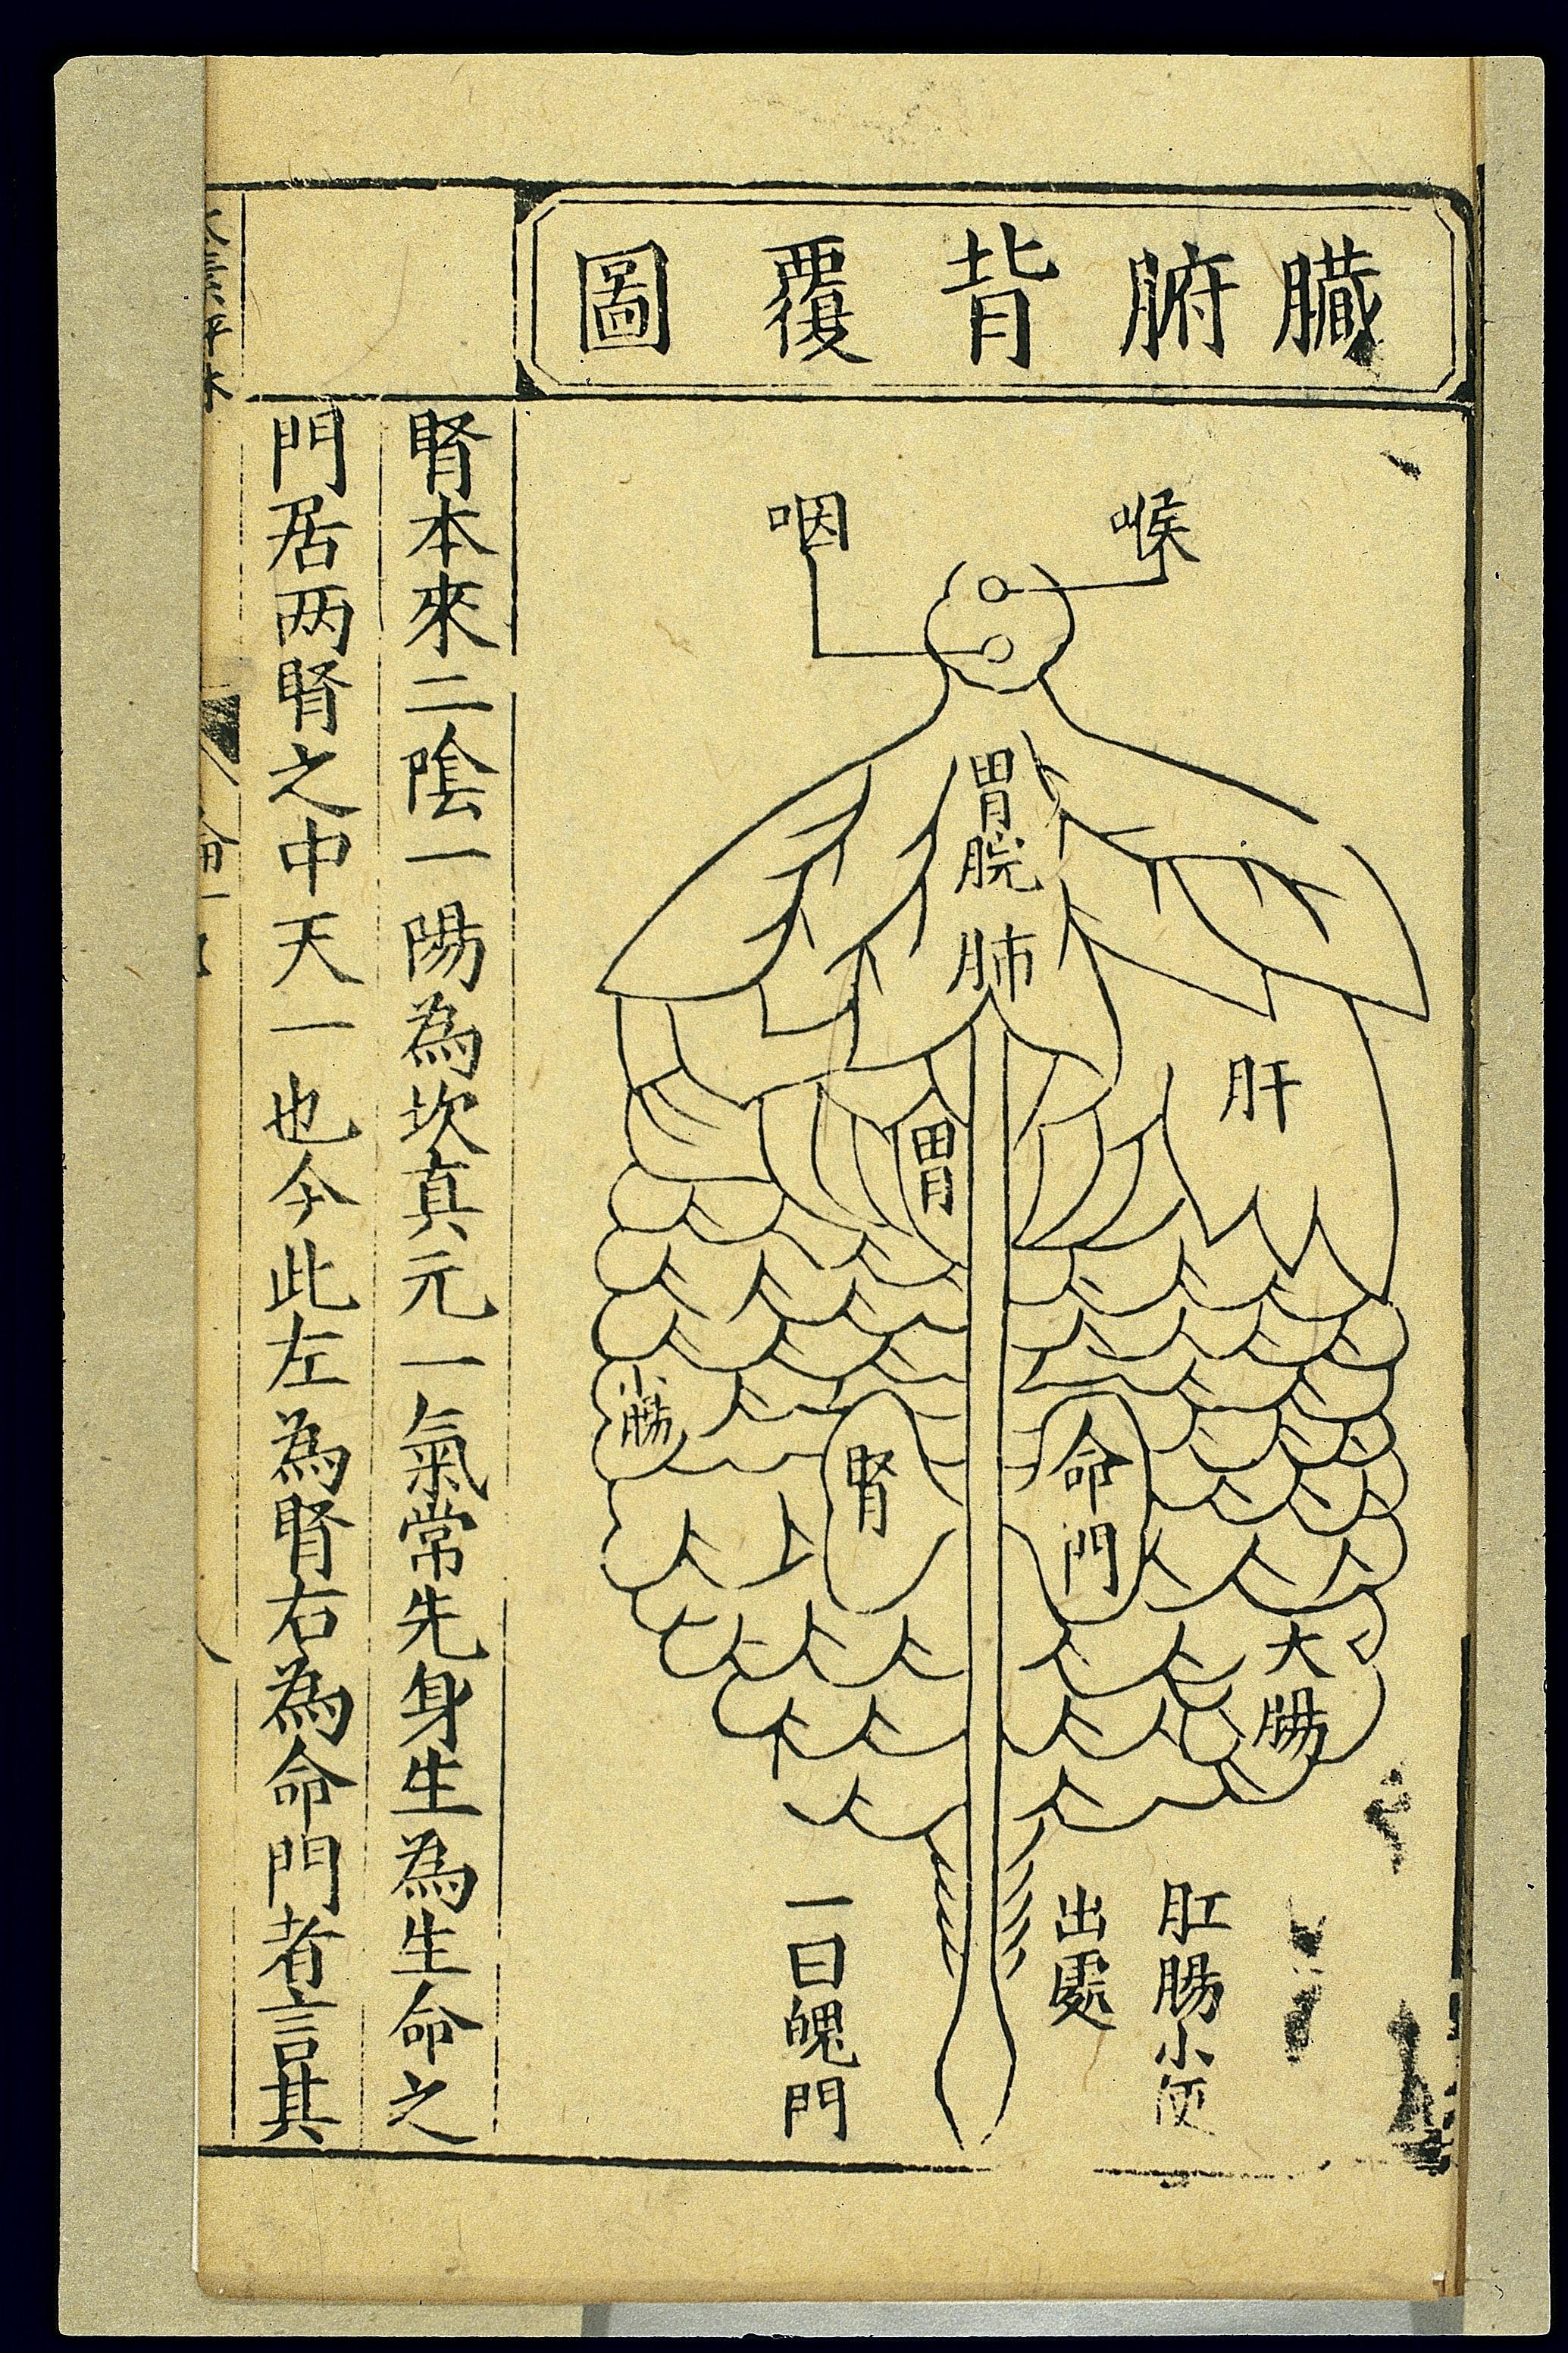 Filedistribution Of Internal Organs Back View Chinese Woodcut